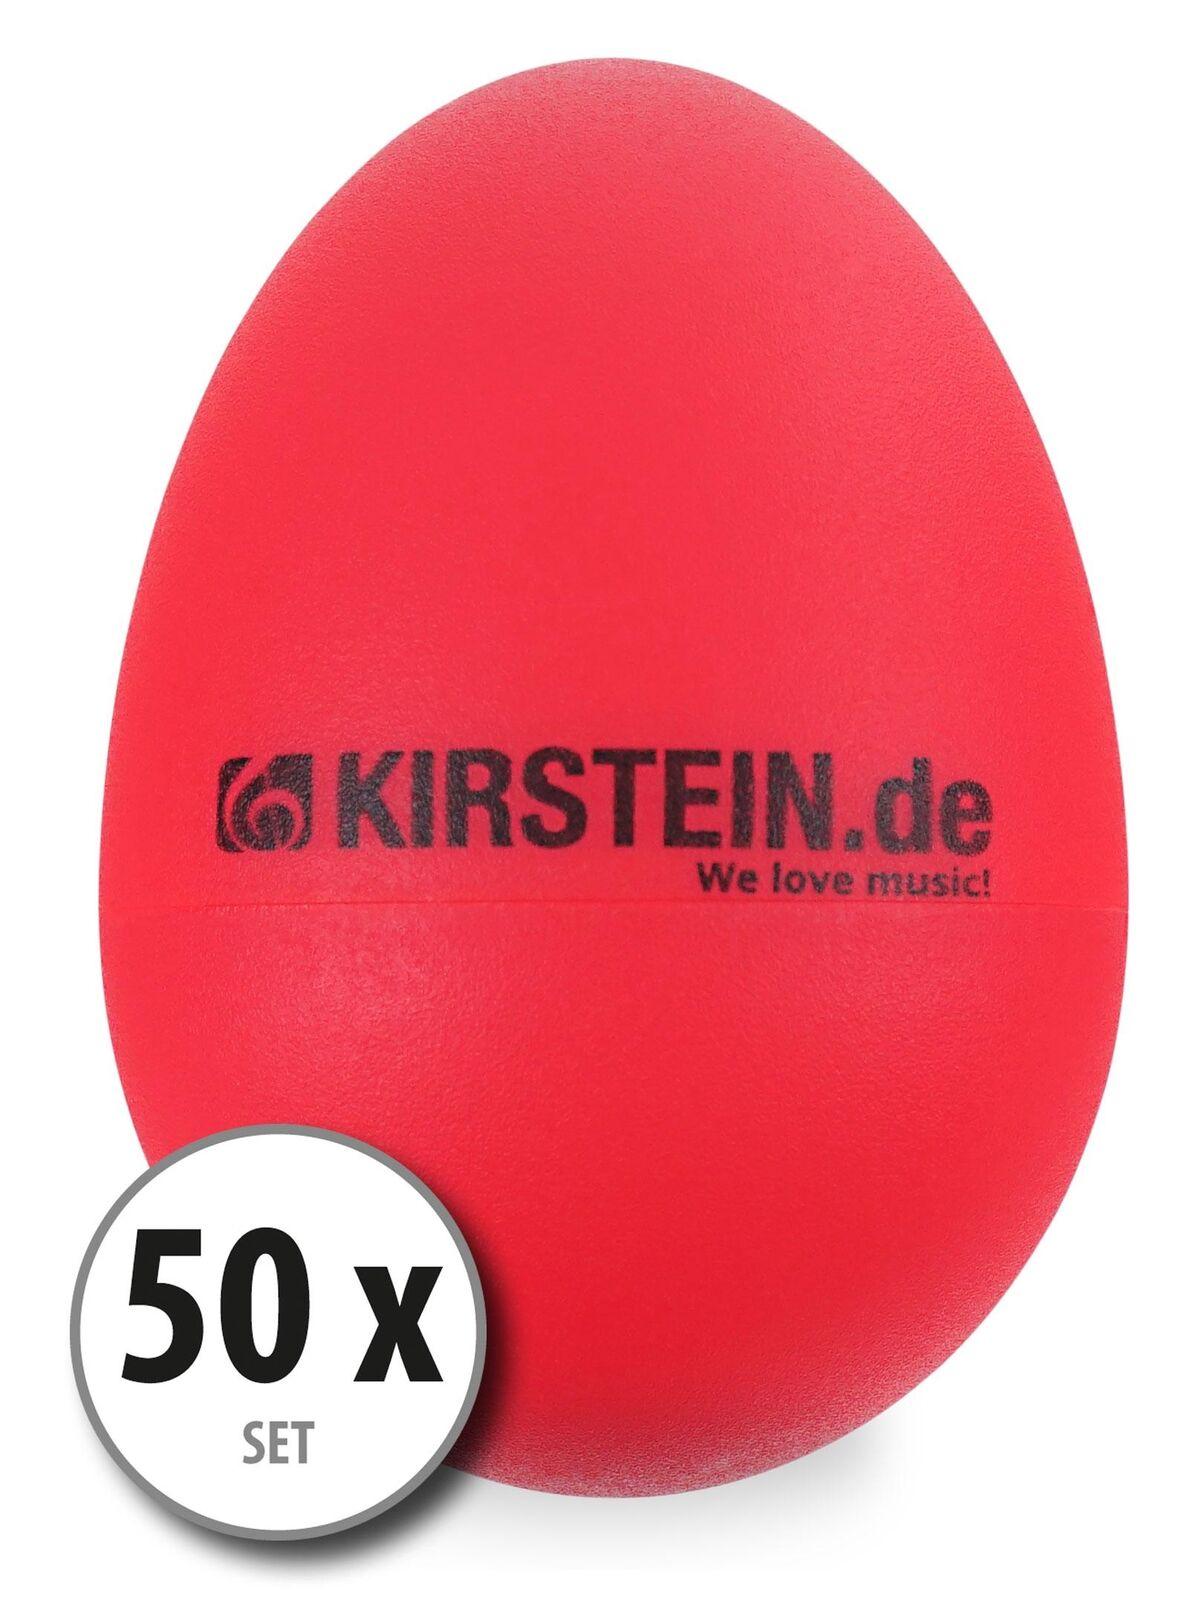 50x roter Egg Shaker Schüttelei zur Percussion-Begleitung im Studio oder Live